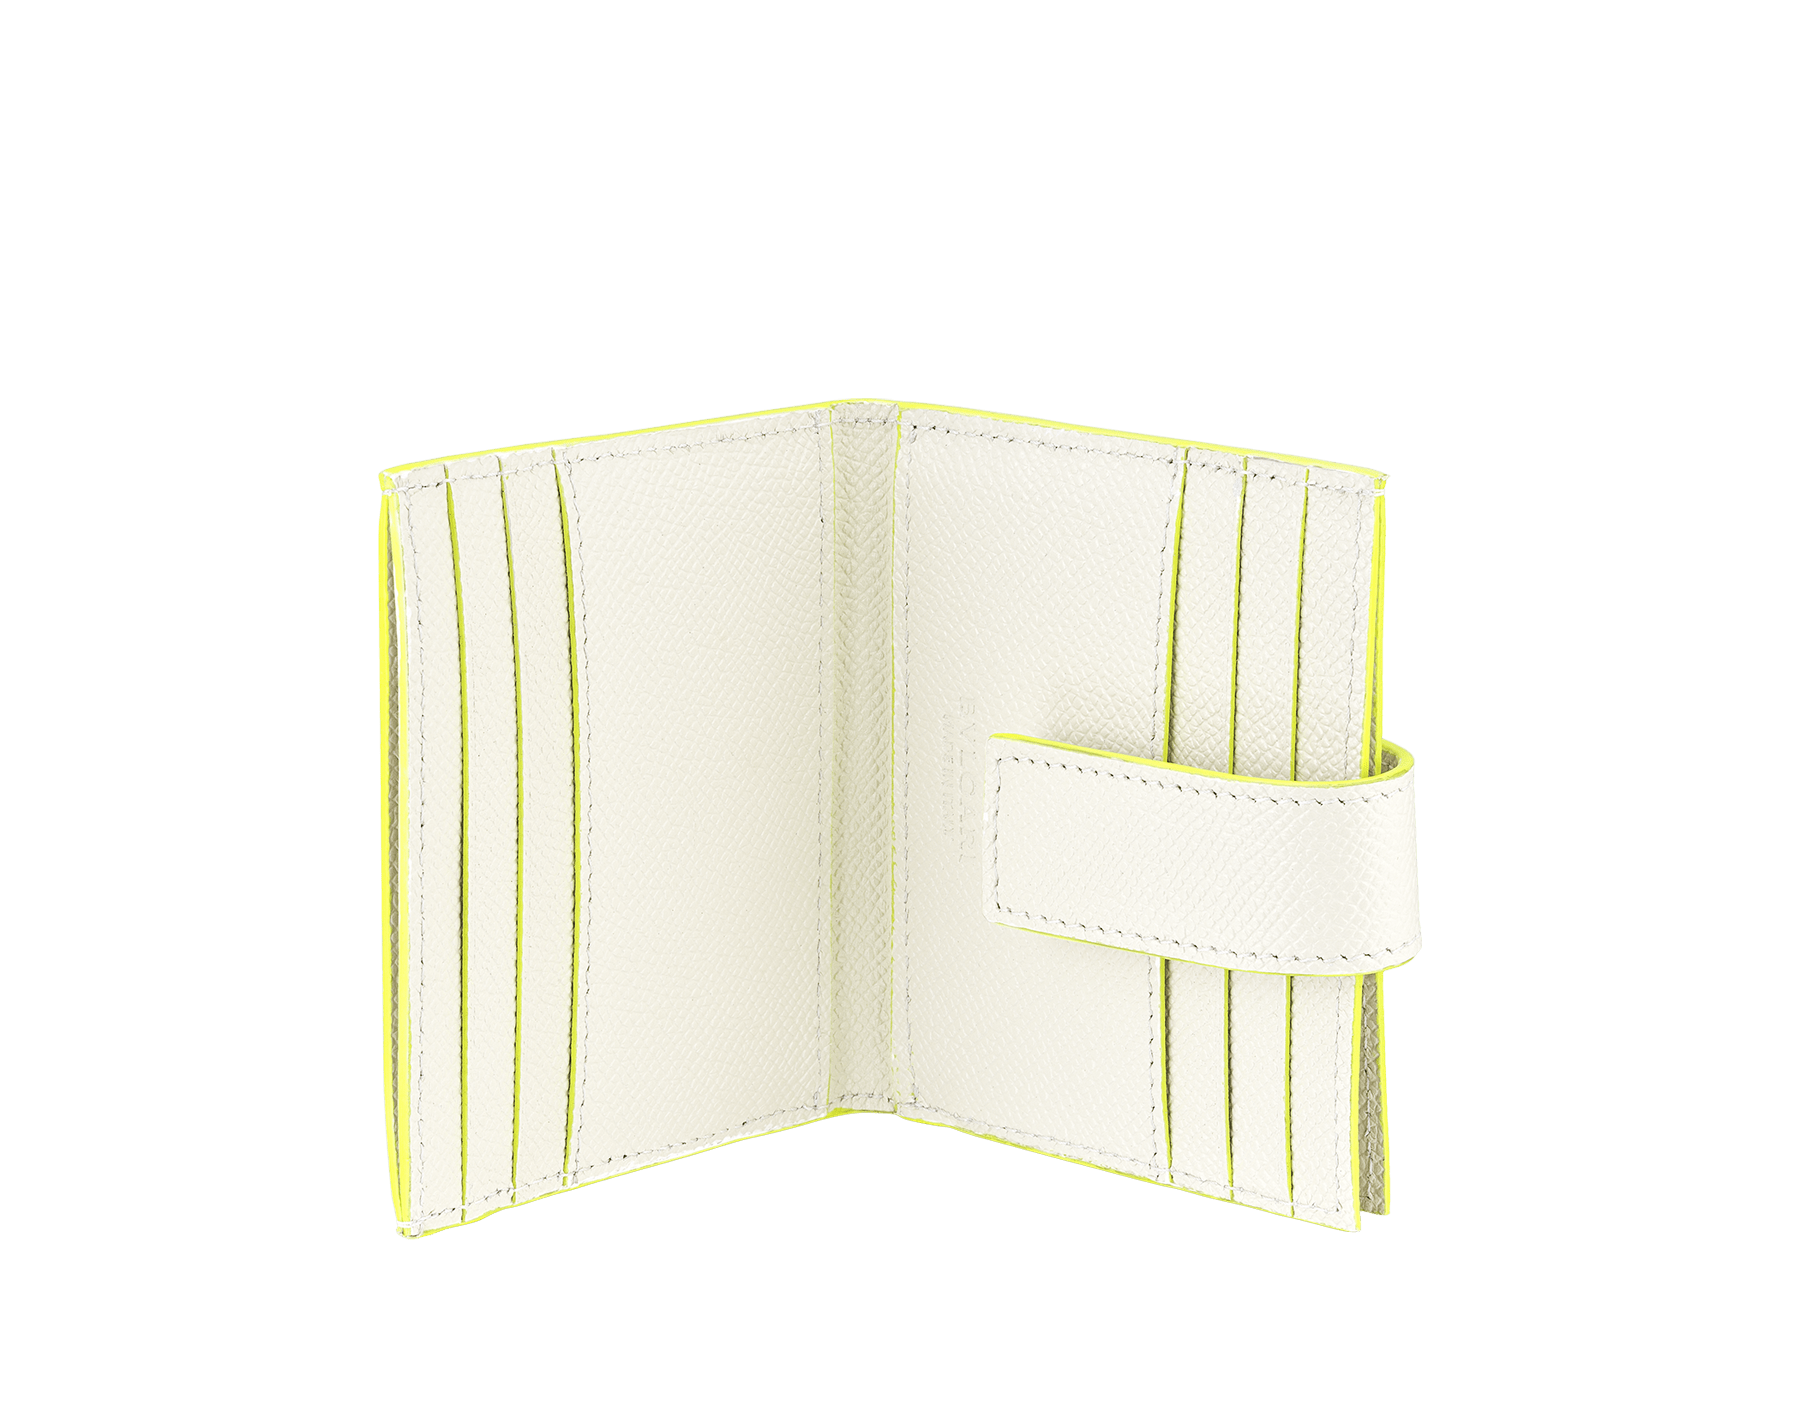 BVLGARI x FRAGMENT by Hiroshi Fujiwara ビジネスカードホルダー。ホワイトと蛍光イエローのグレインカーフレザー製。特別なBVLGARI FRGMTのブラックロゴプリント。 289527 image 2